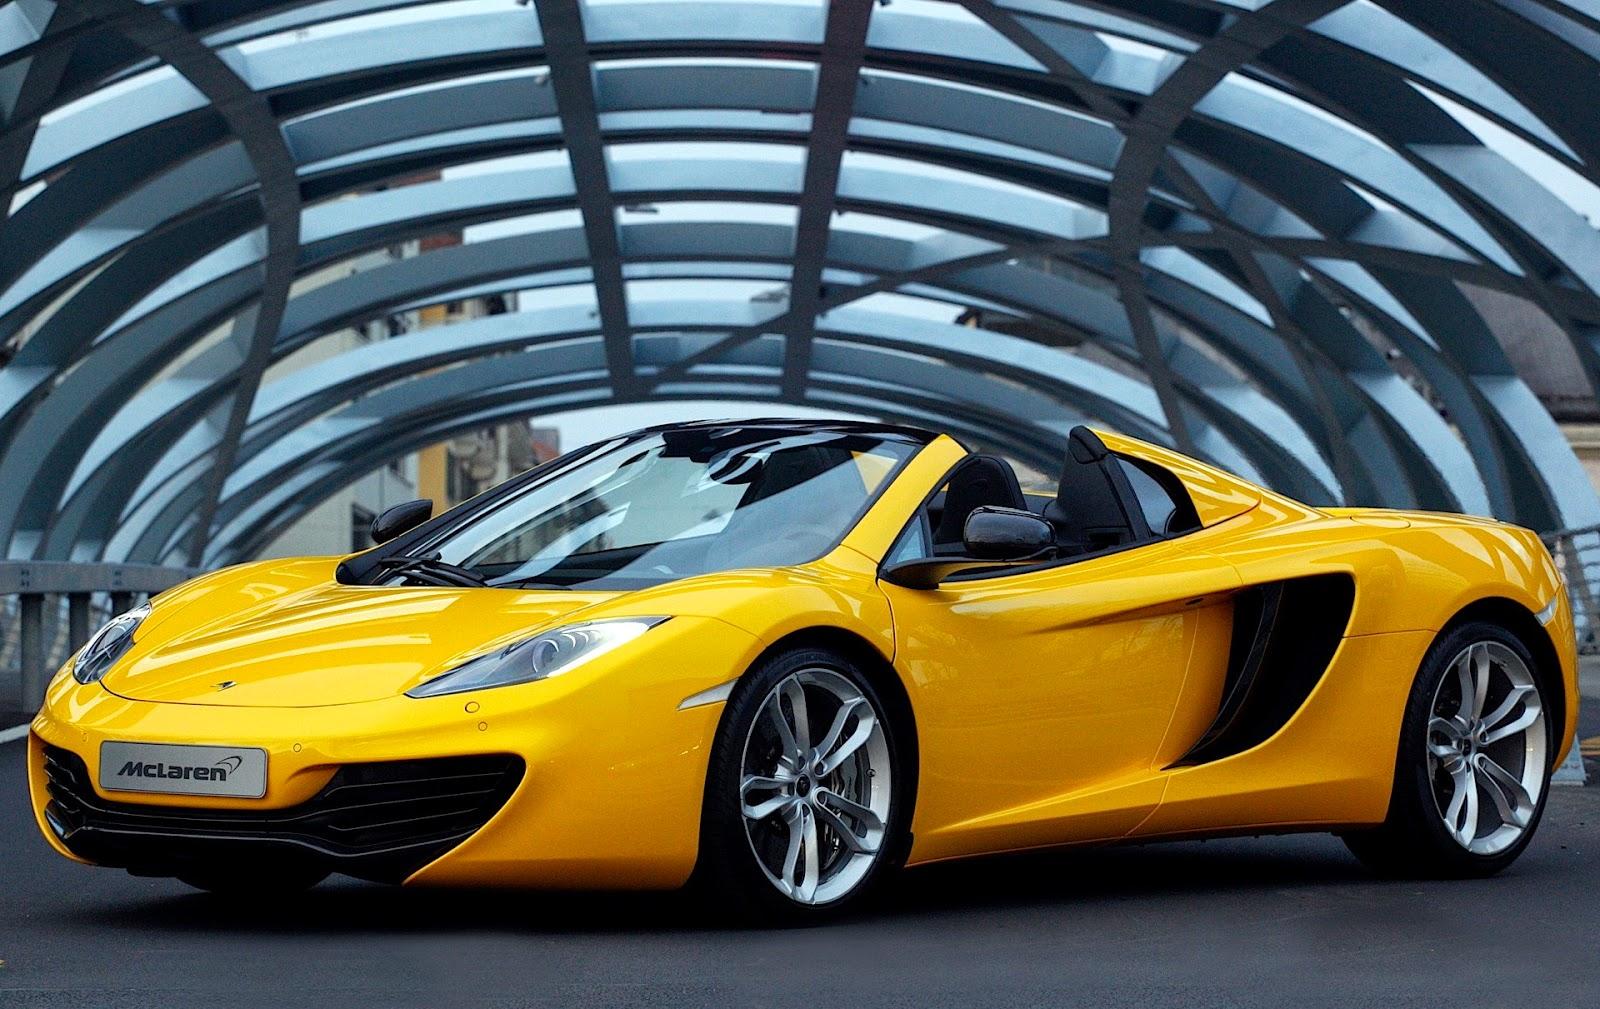 Mclaren Cars Wallpaper Hd: McLaren P1 Car Wallpapers HD